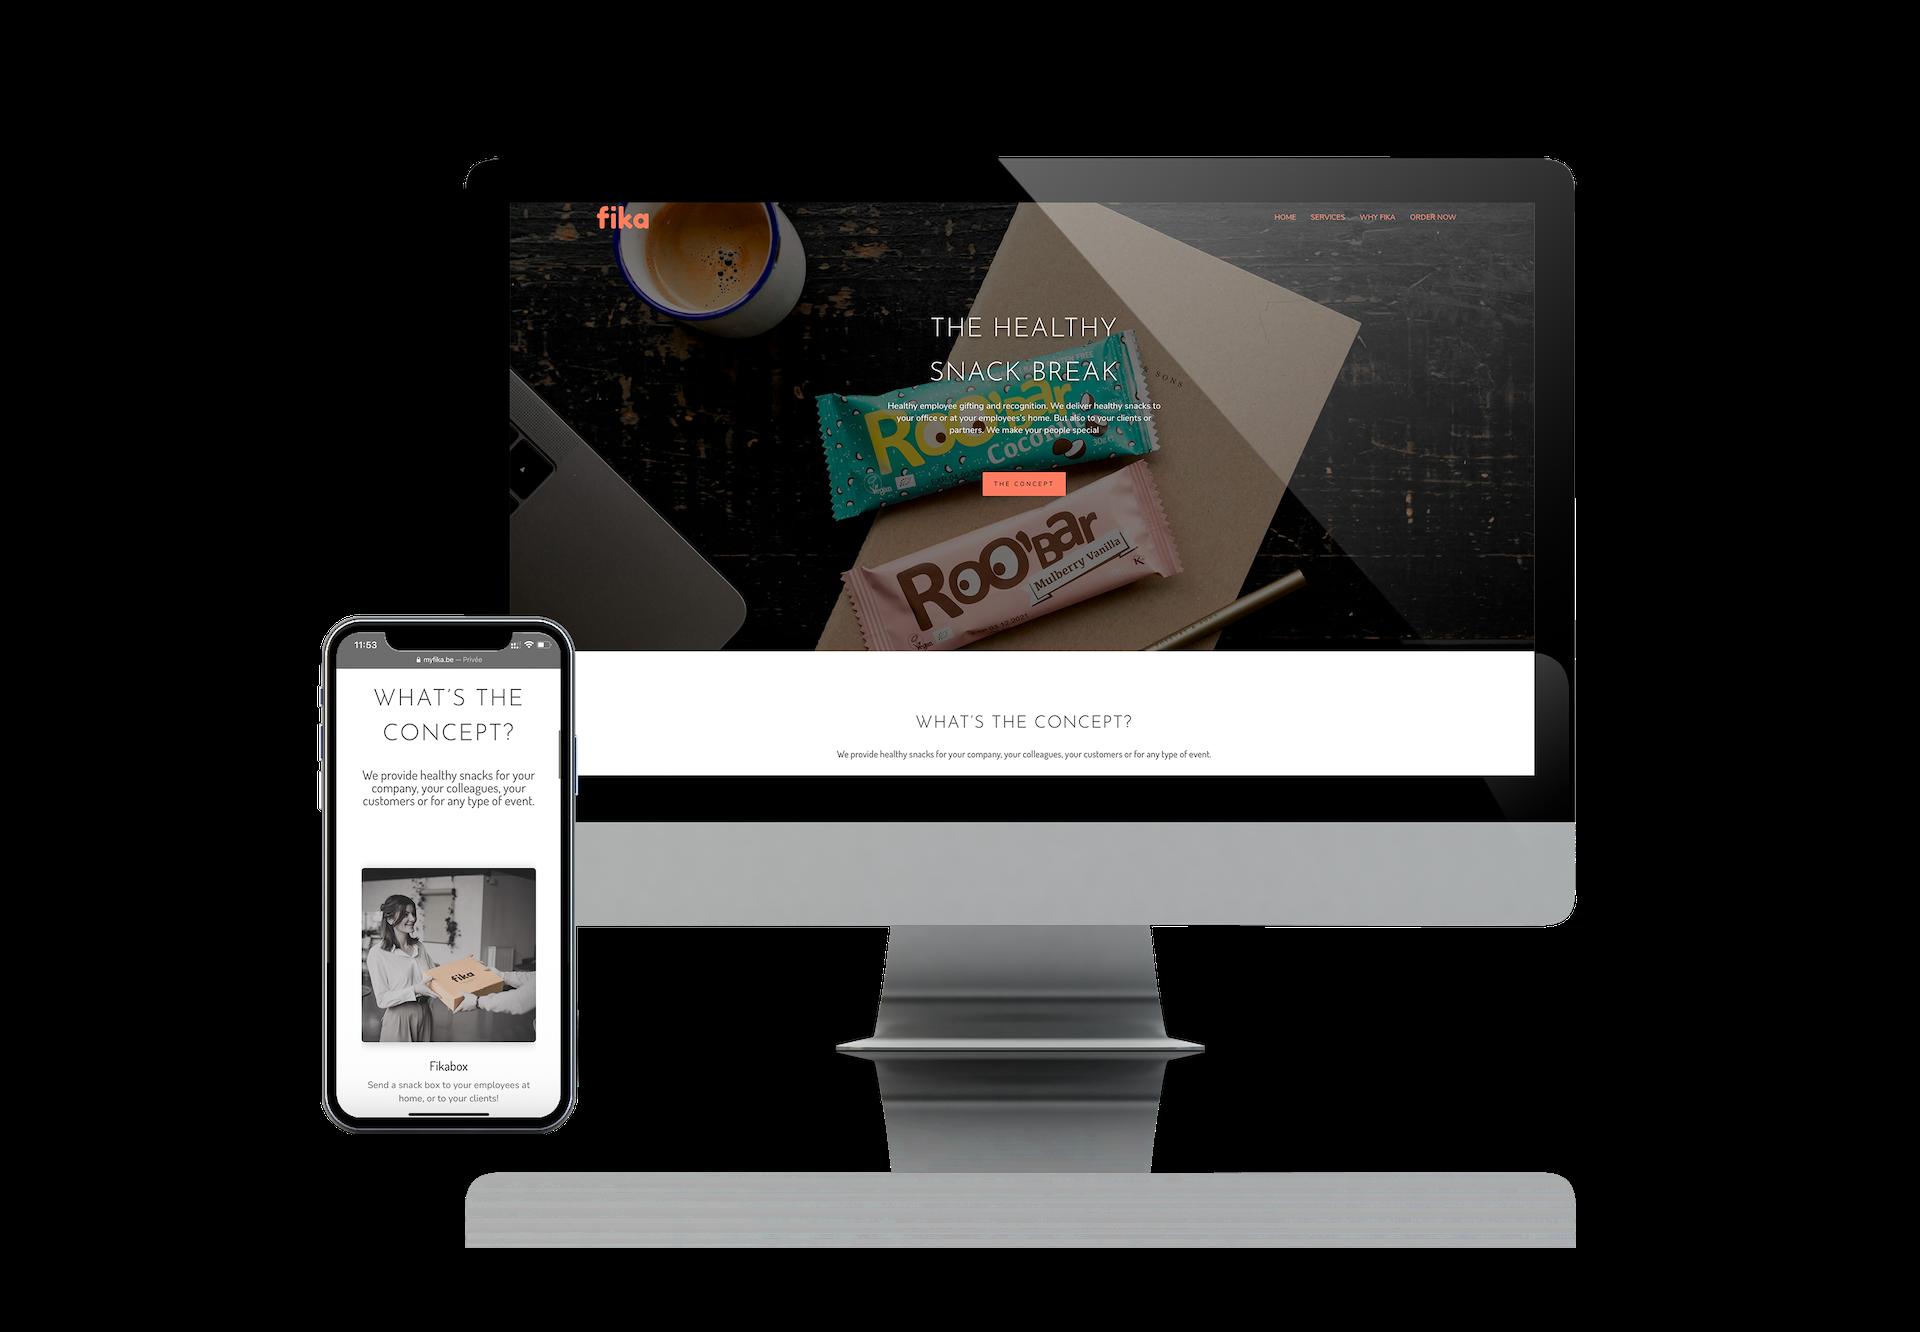 Myfika - Création de site internet